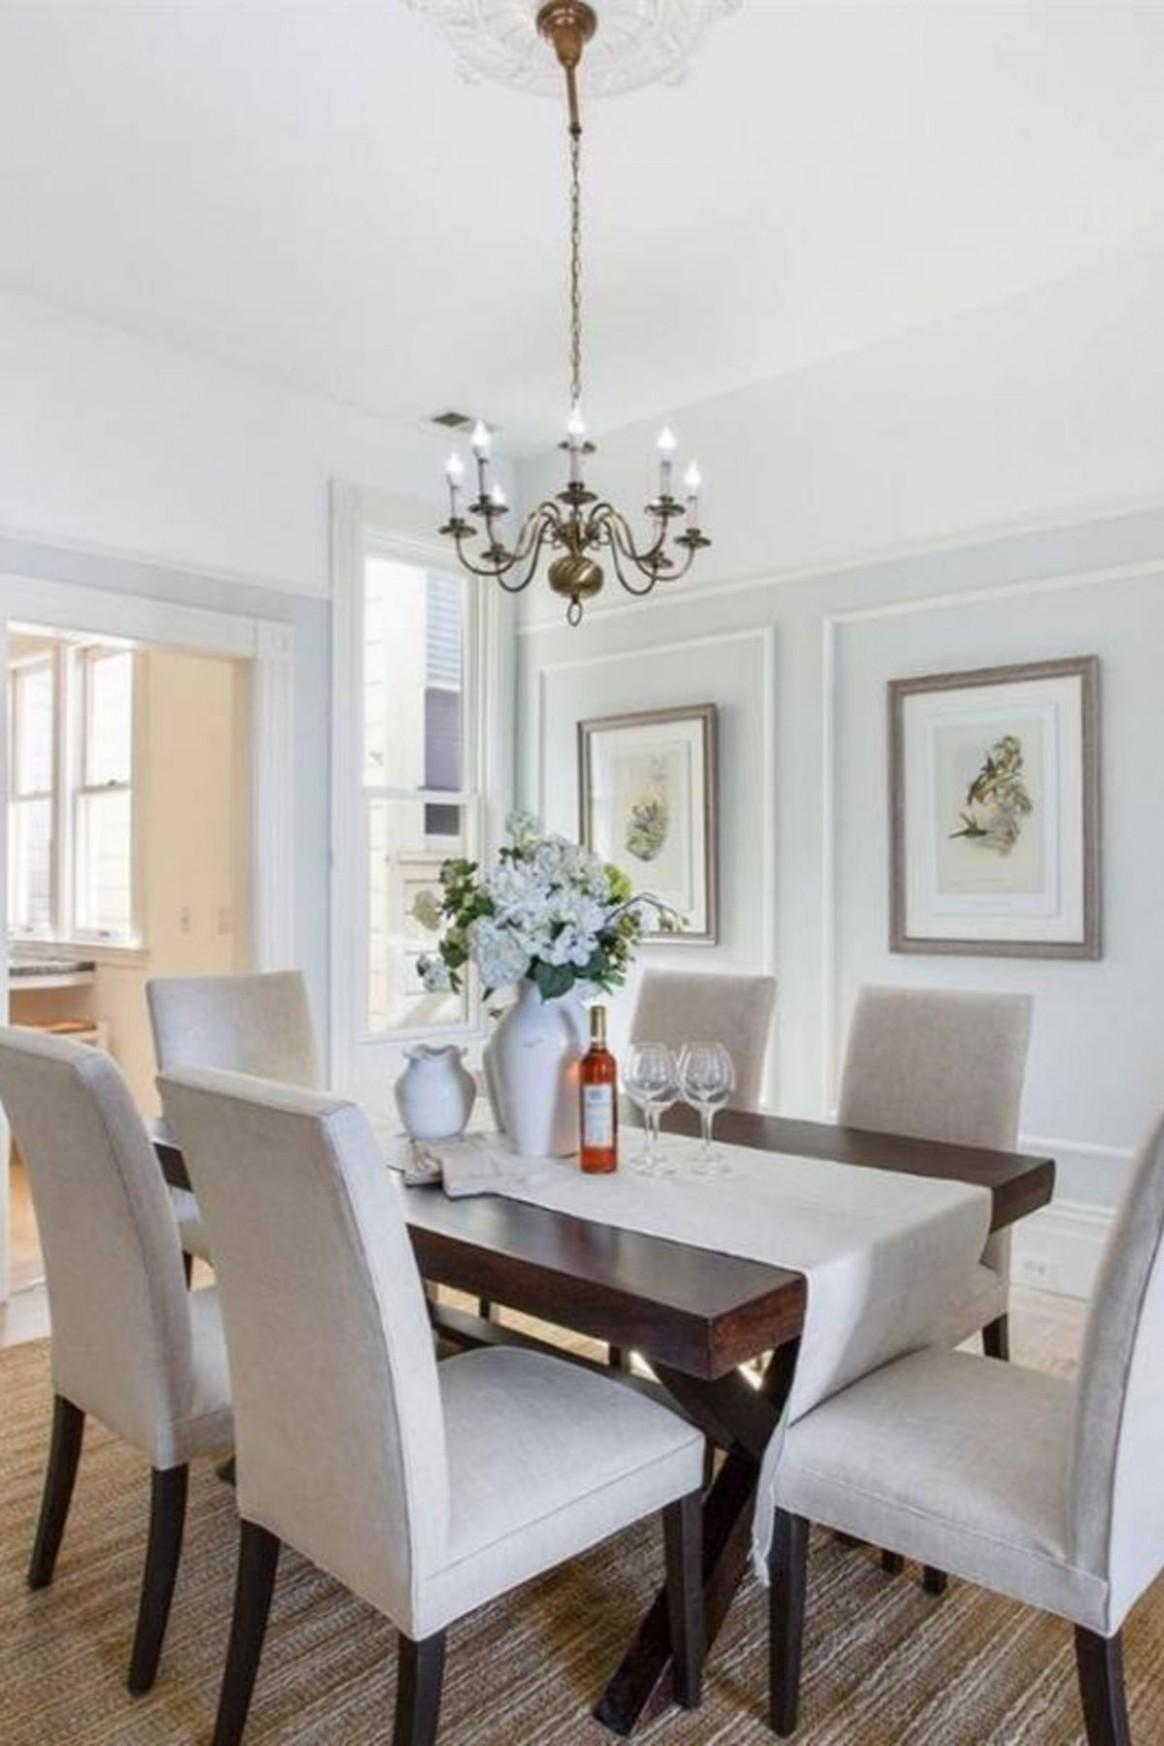 Room redo: Traditional fresh dining room  Classic dining room  - Dining Room Ideas Classic